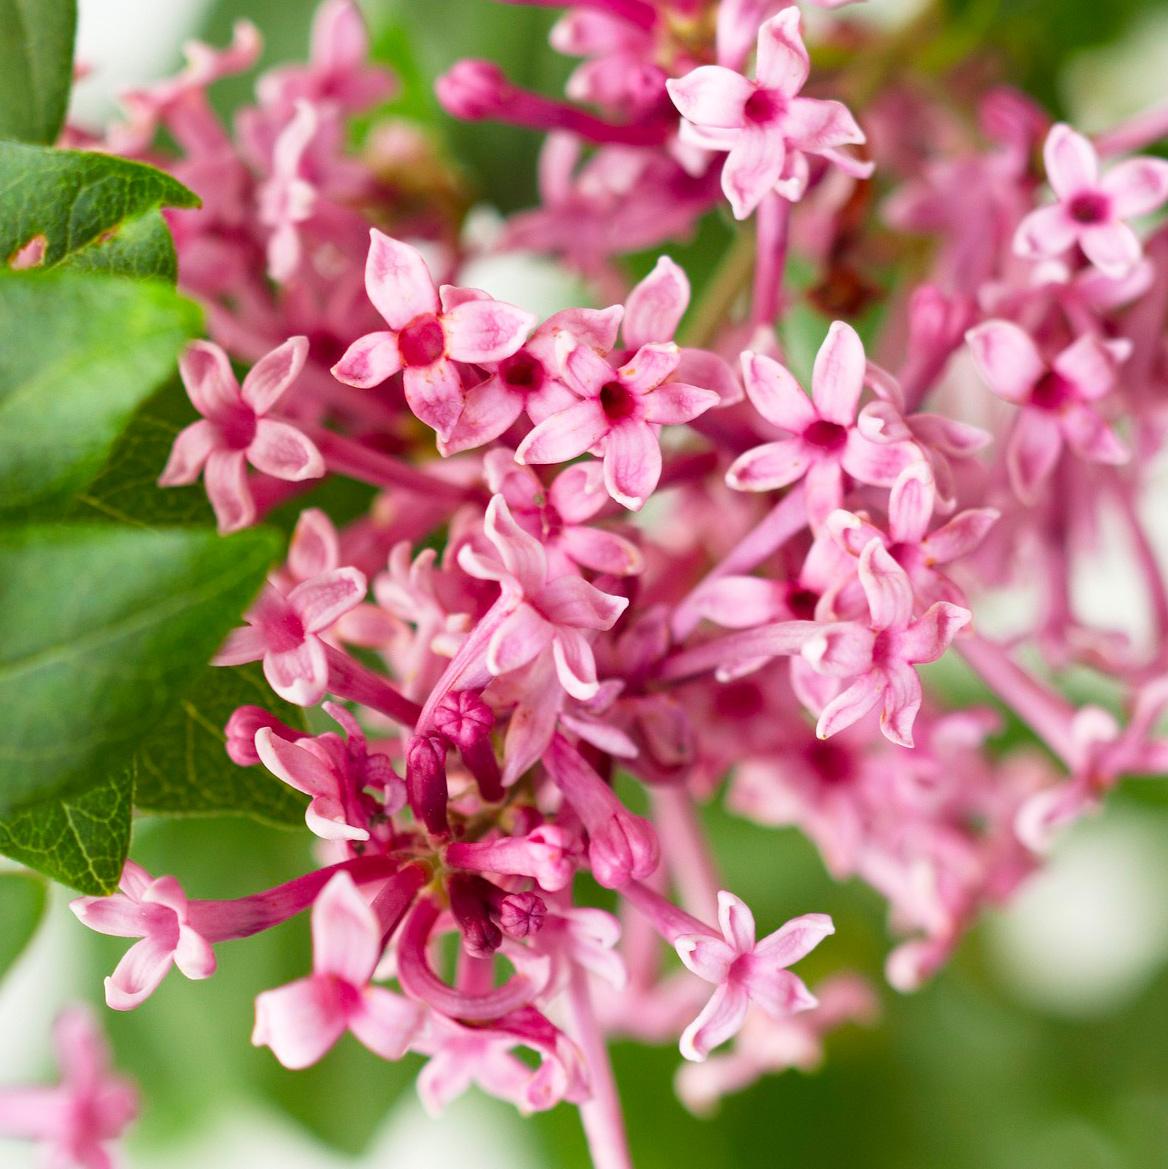 Repeating blooms